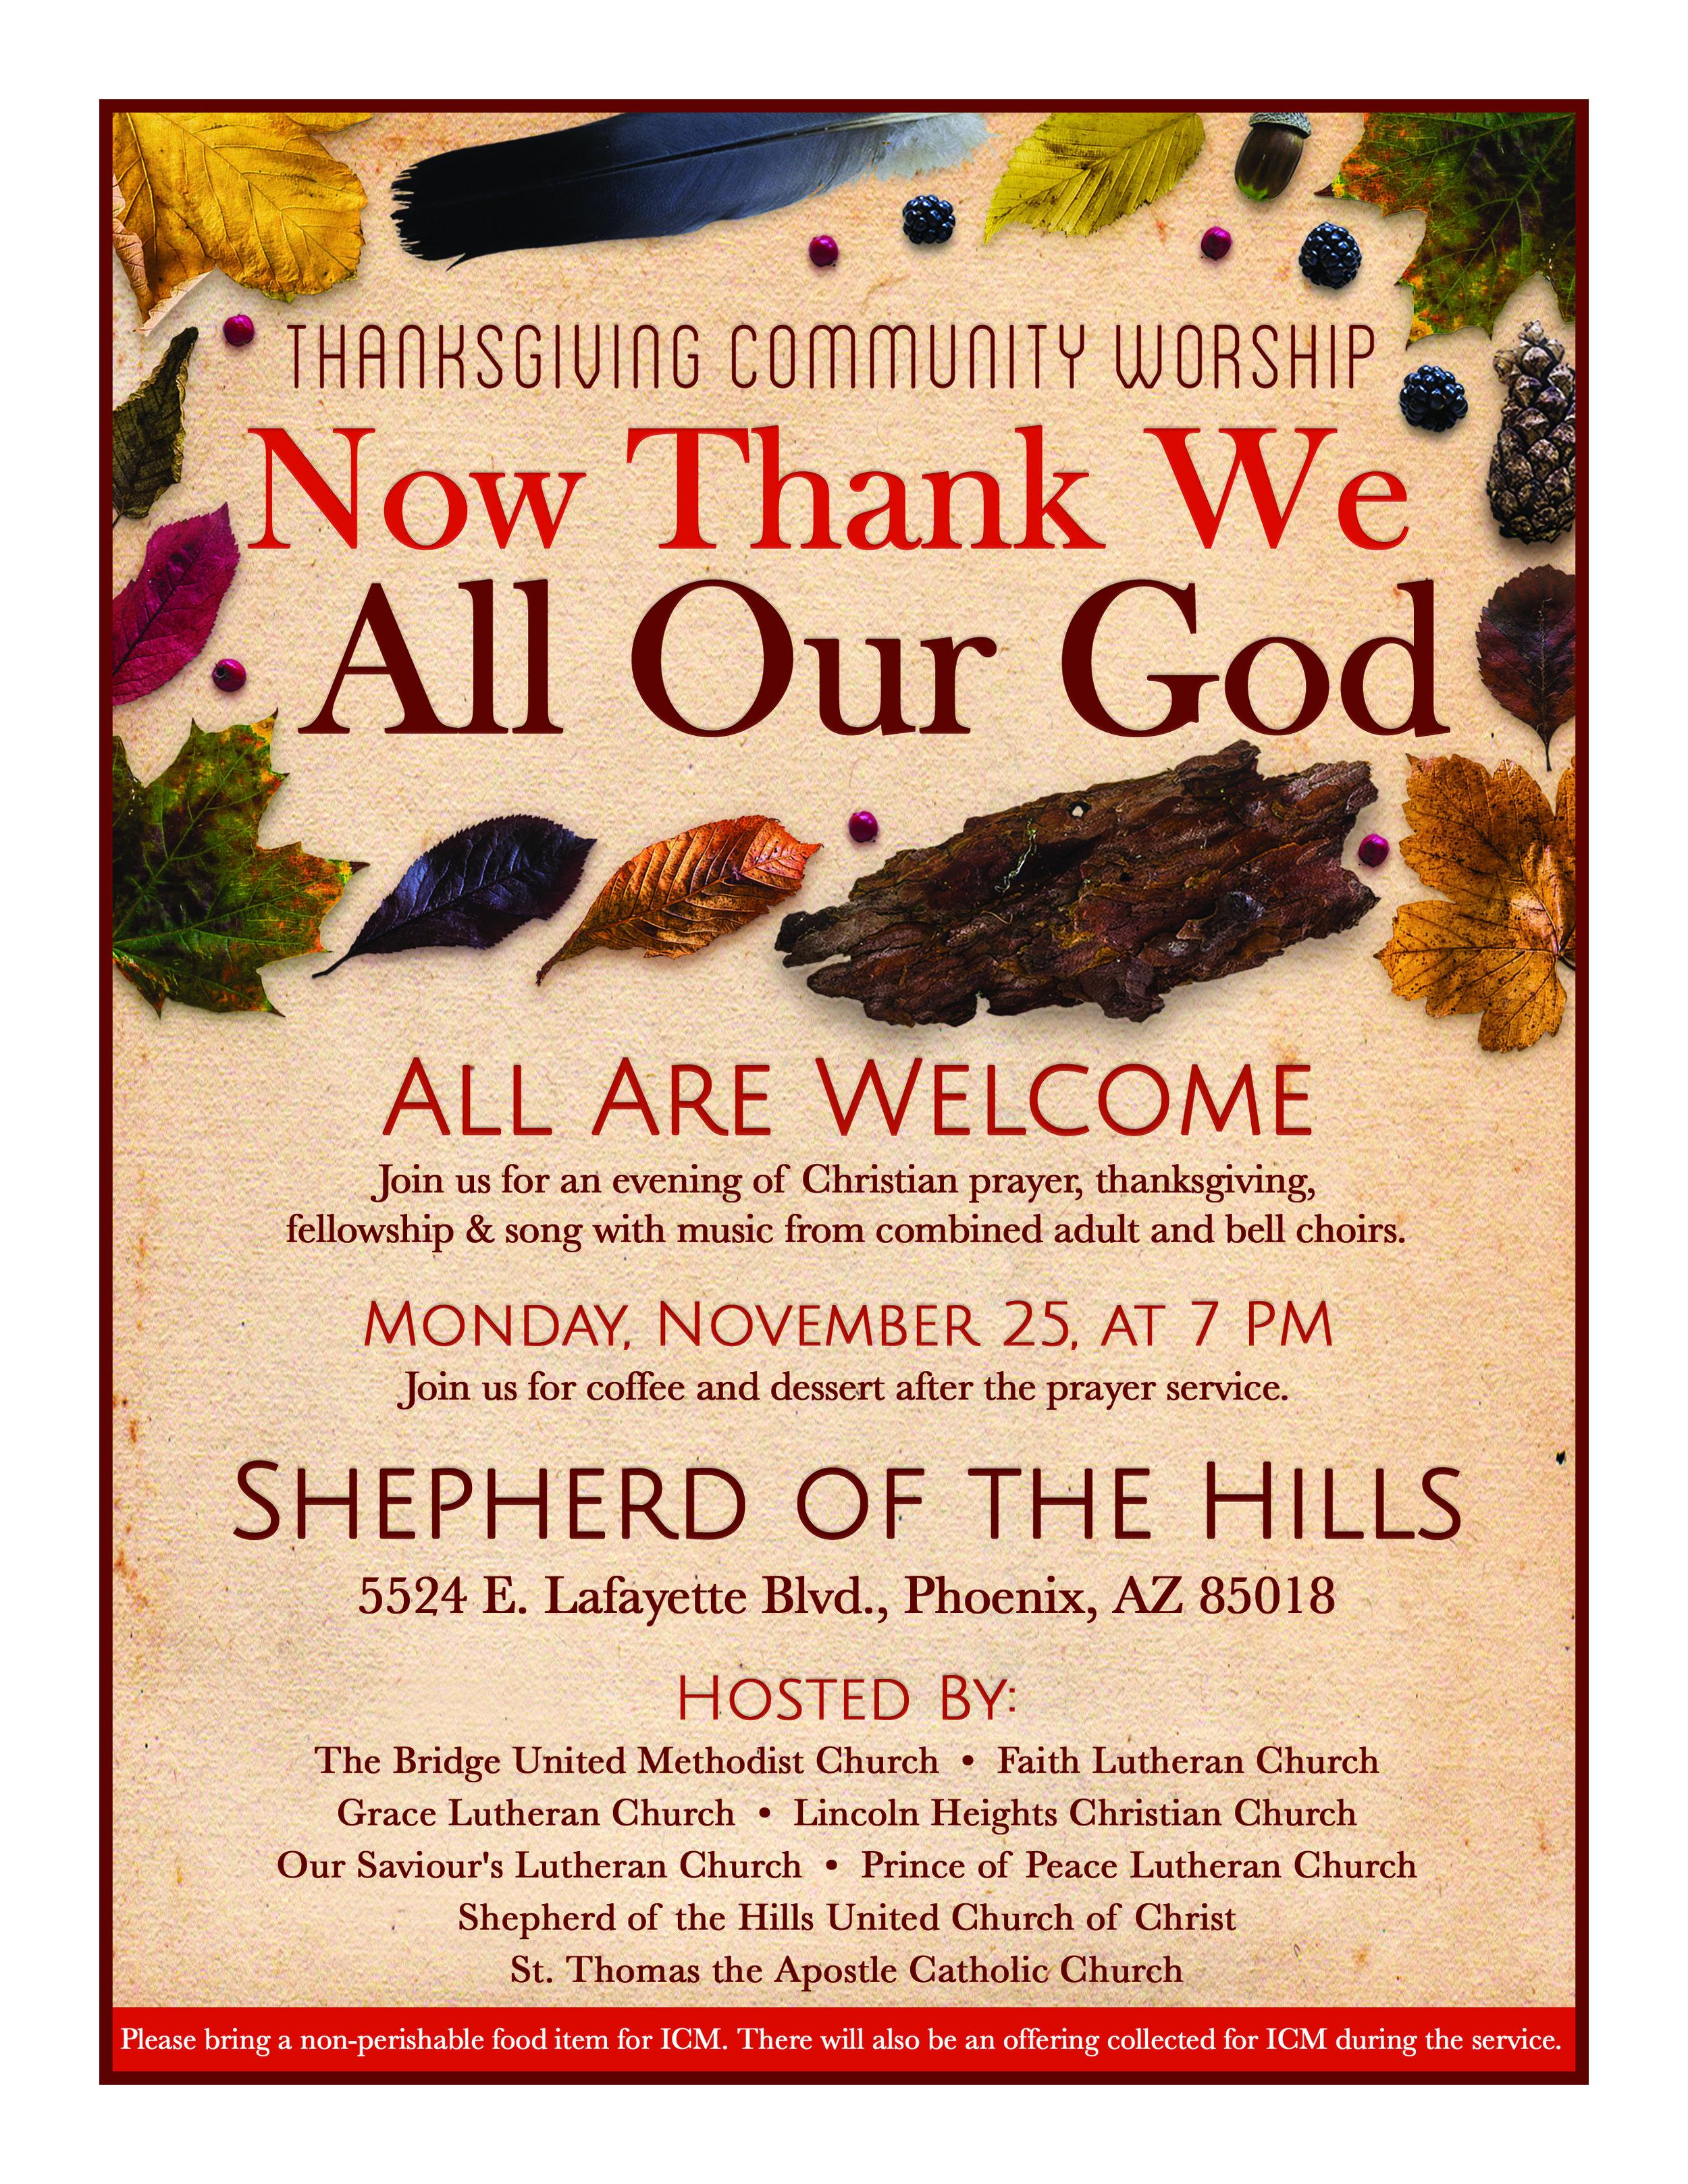 SOH - Thanksgiving Community Worship Poster.jpg